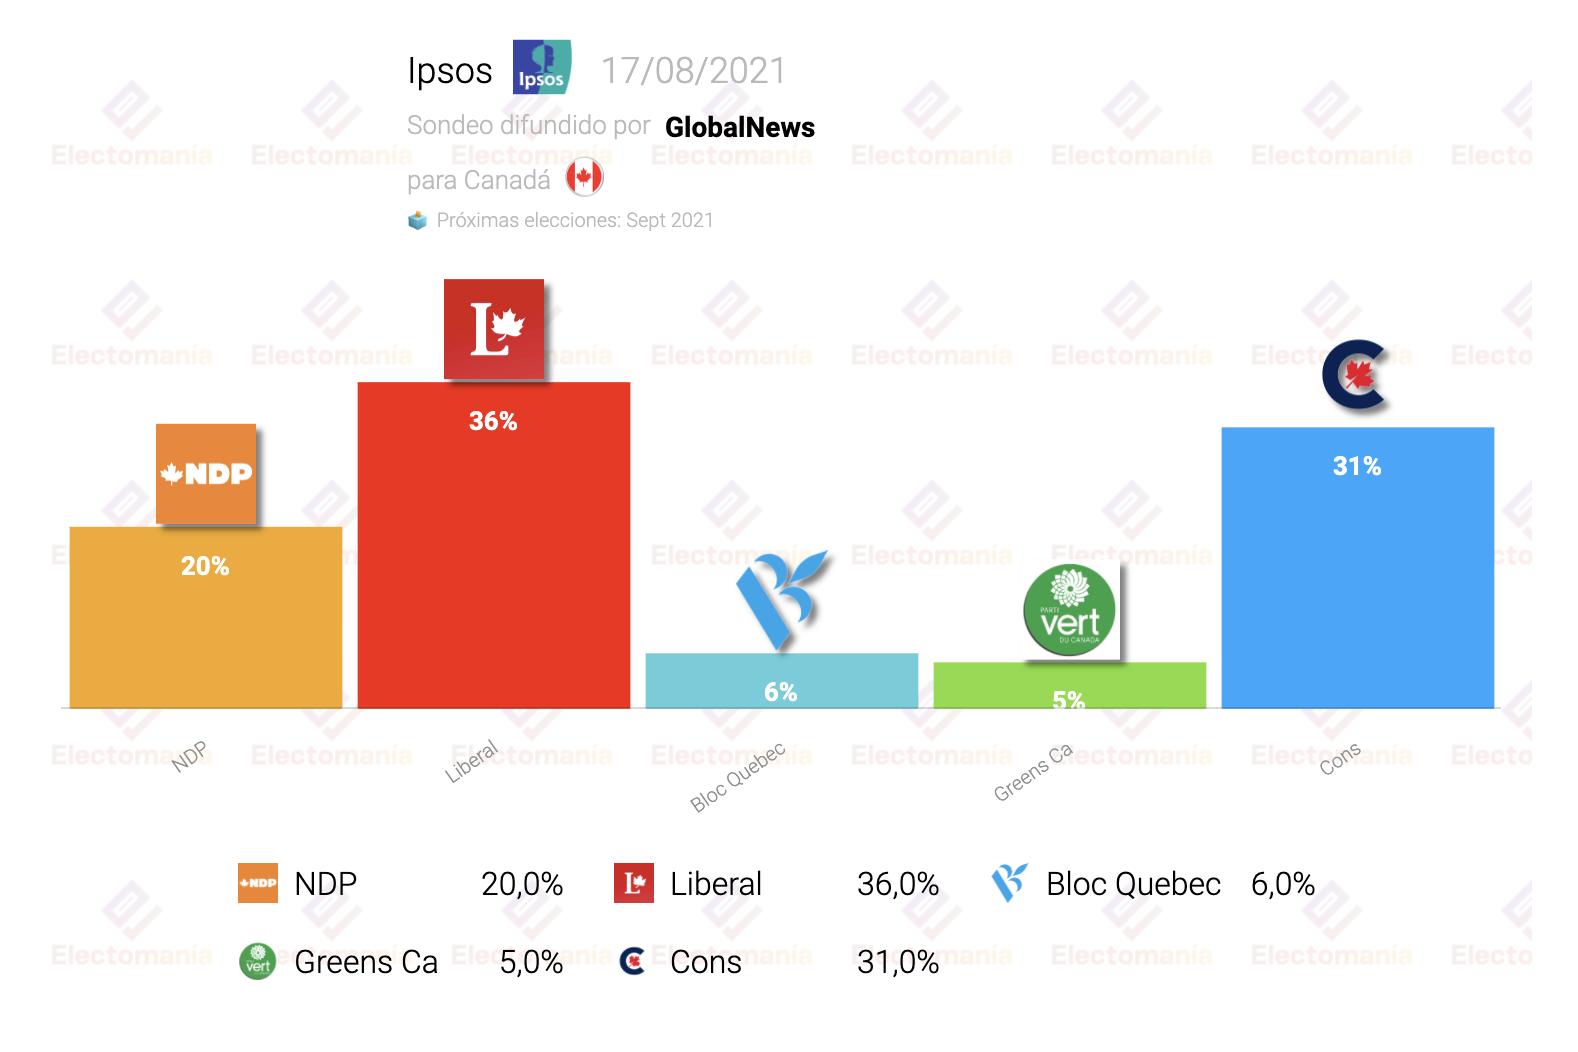 Sondeo de Ipsos para Canadá